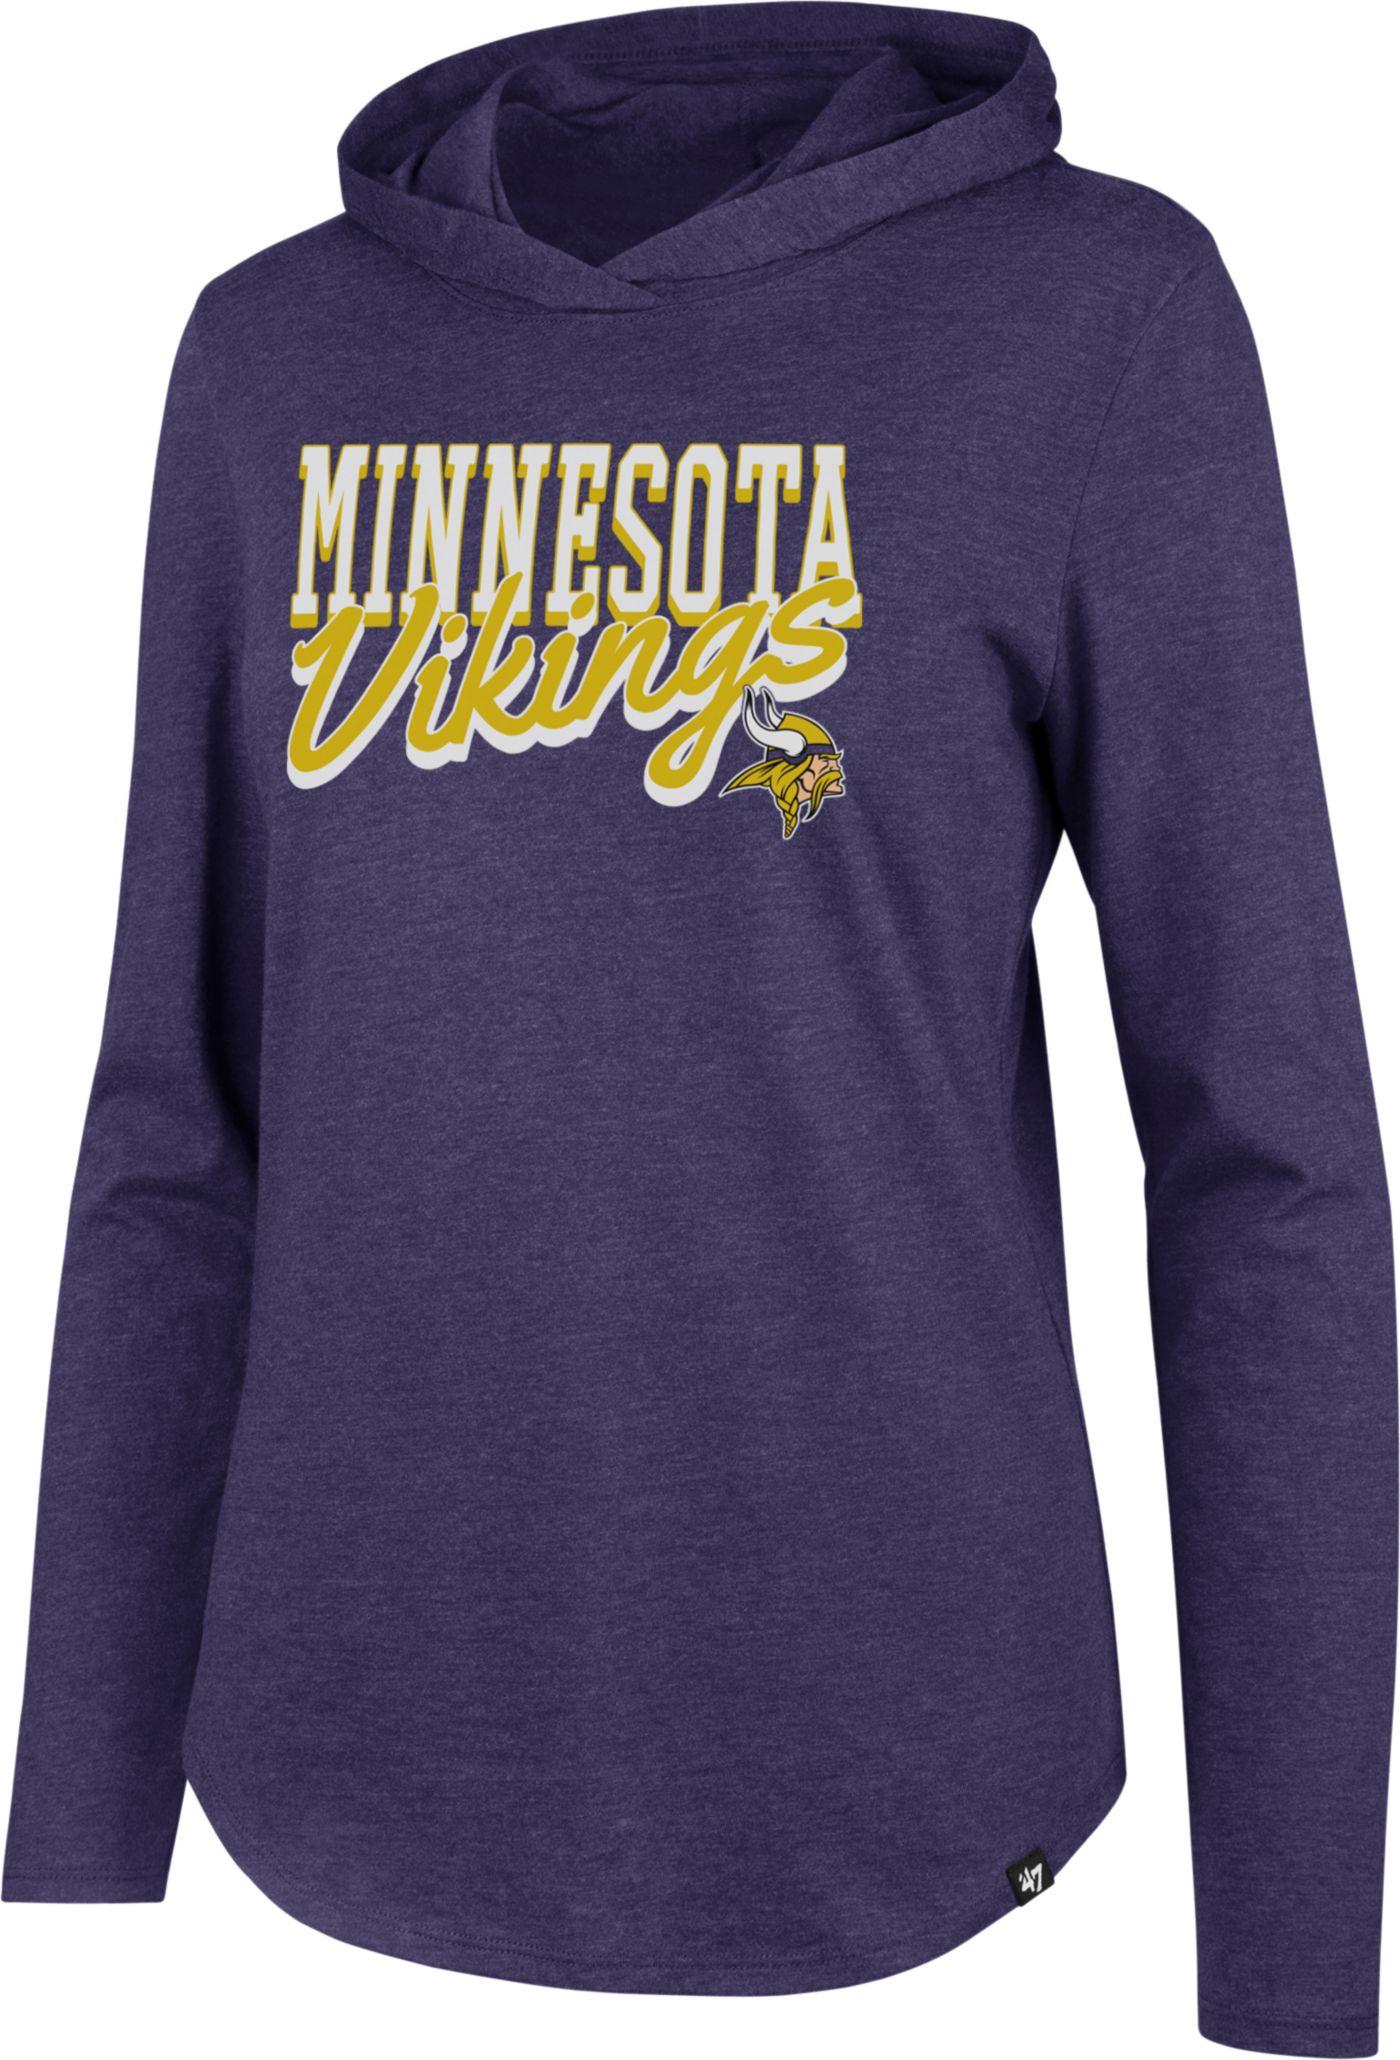 '47 Women's Minnesota Vikings Club Purple Hooded Long Sleeve Shirt